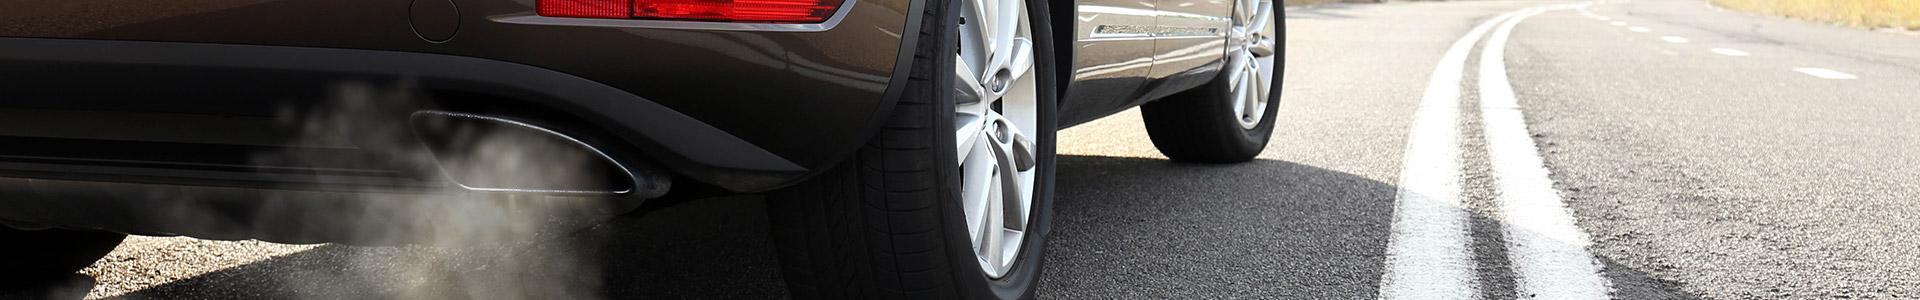 White smoke from car exhaust - what does exhaust smoke mean? | AutoGuru